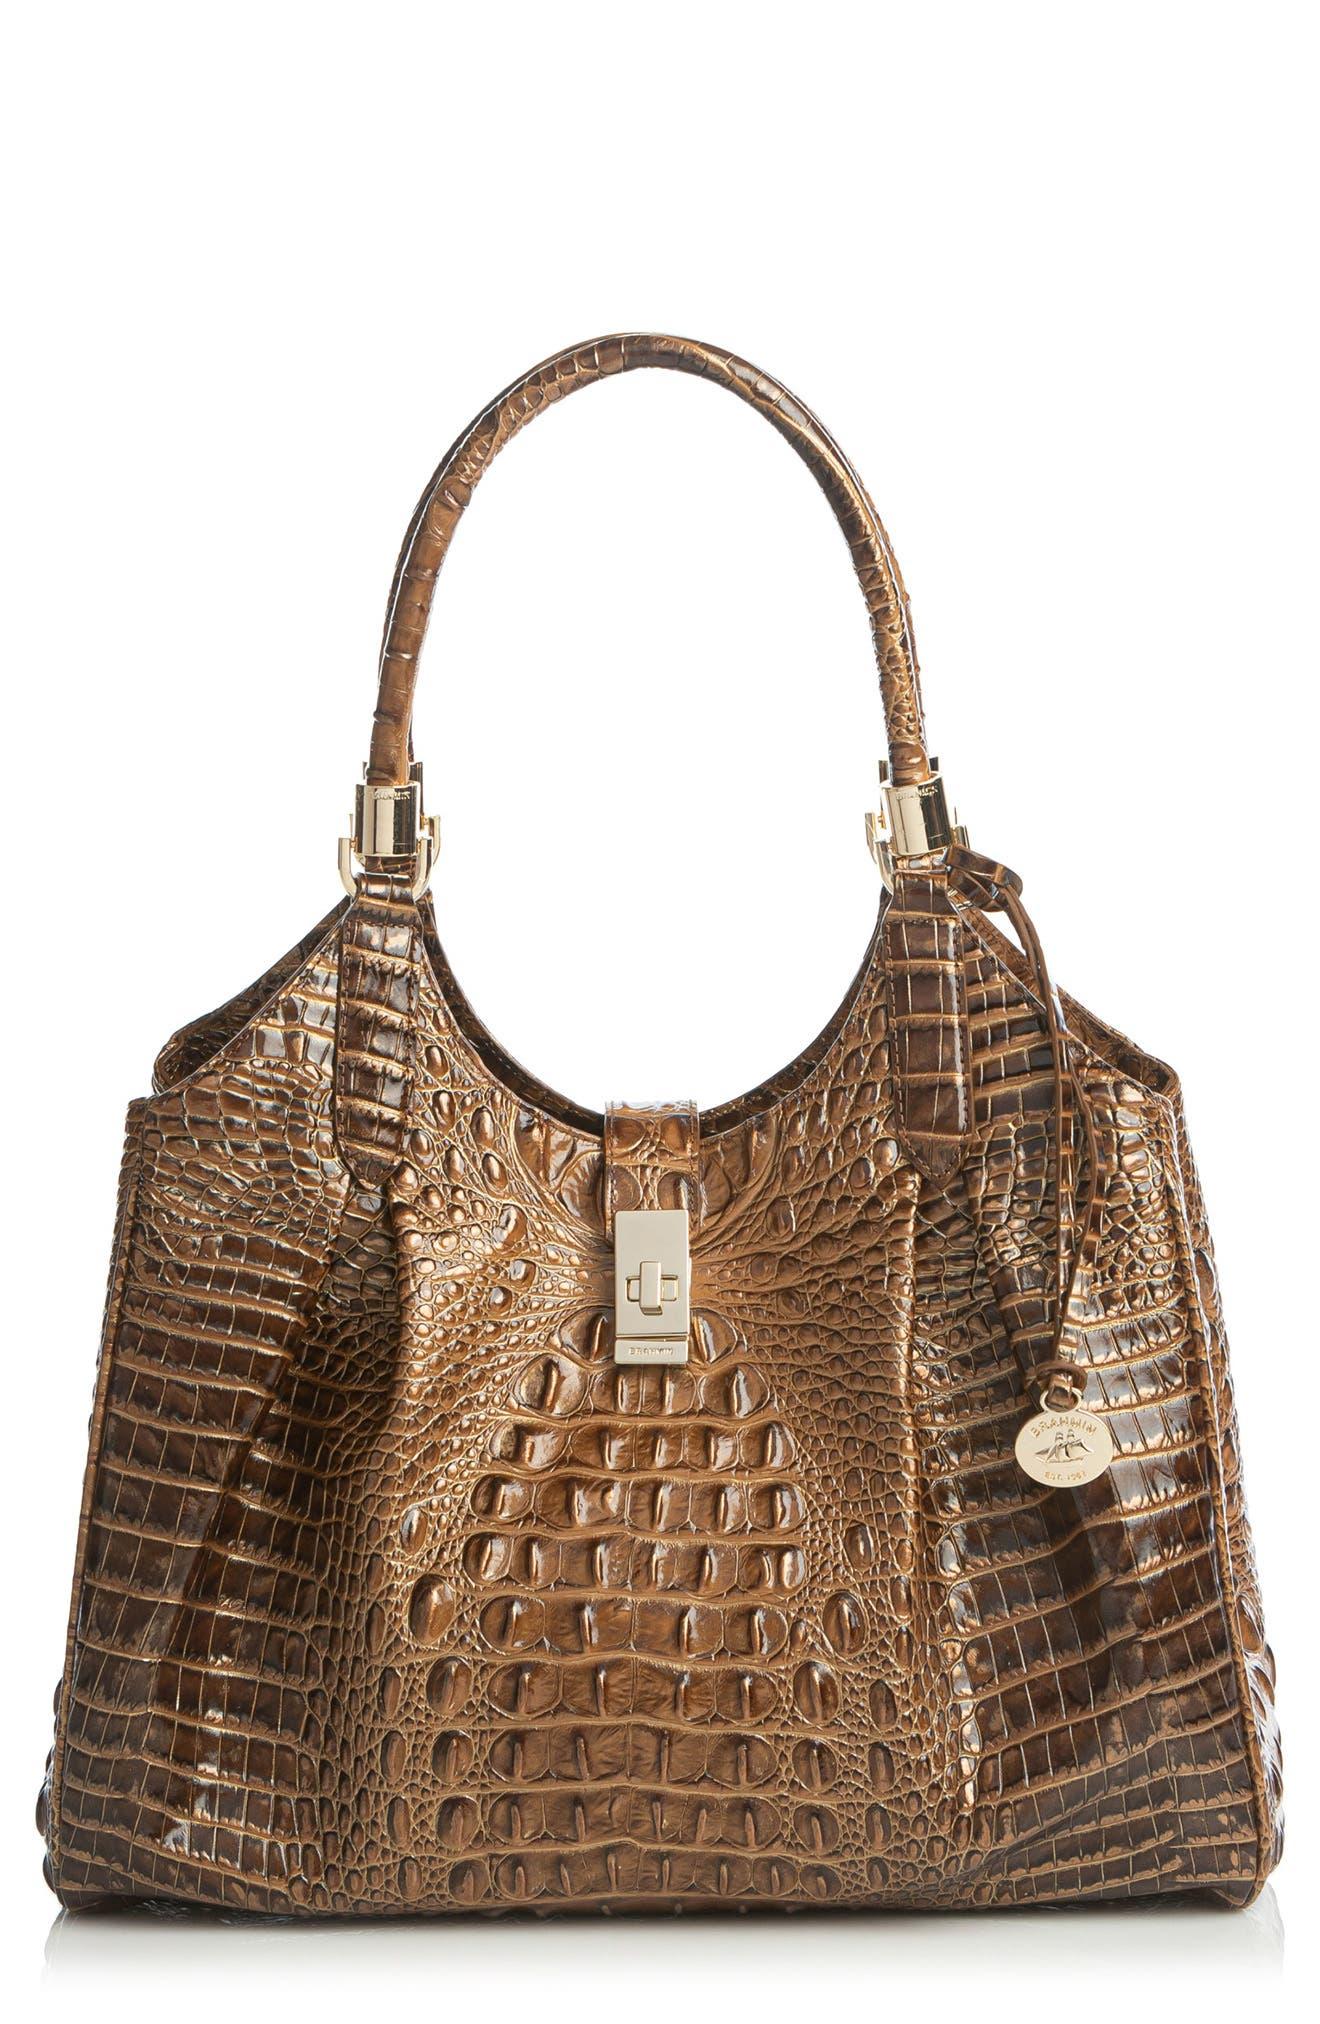 Celia Croc Embossed Leather Top Handle Bag